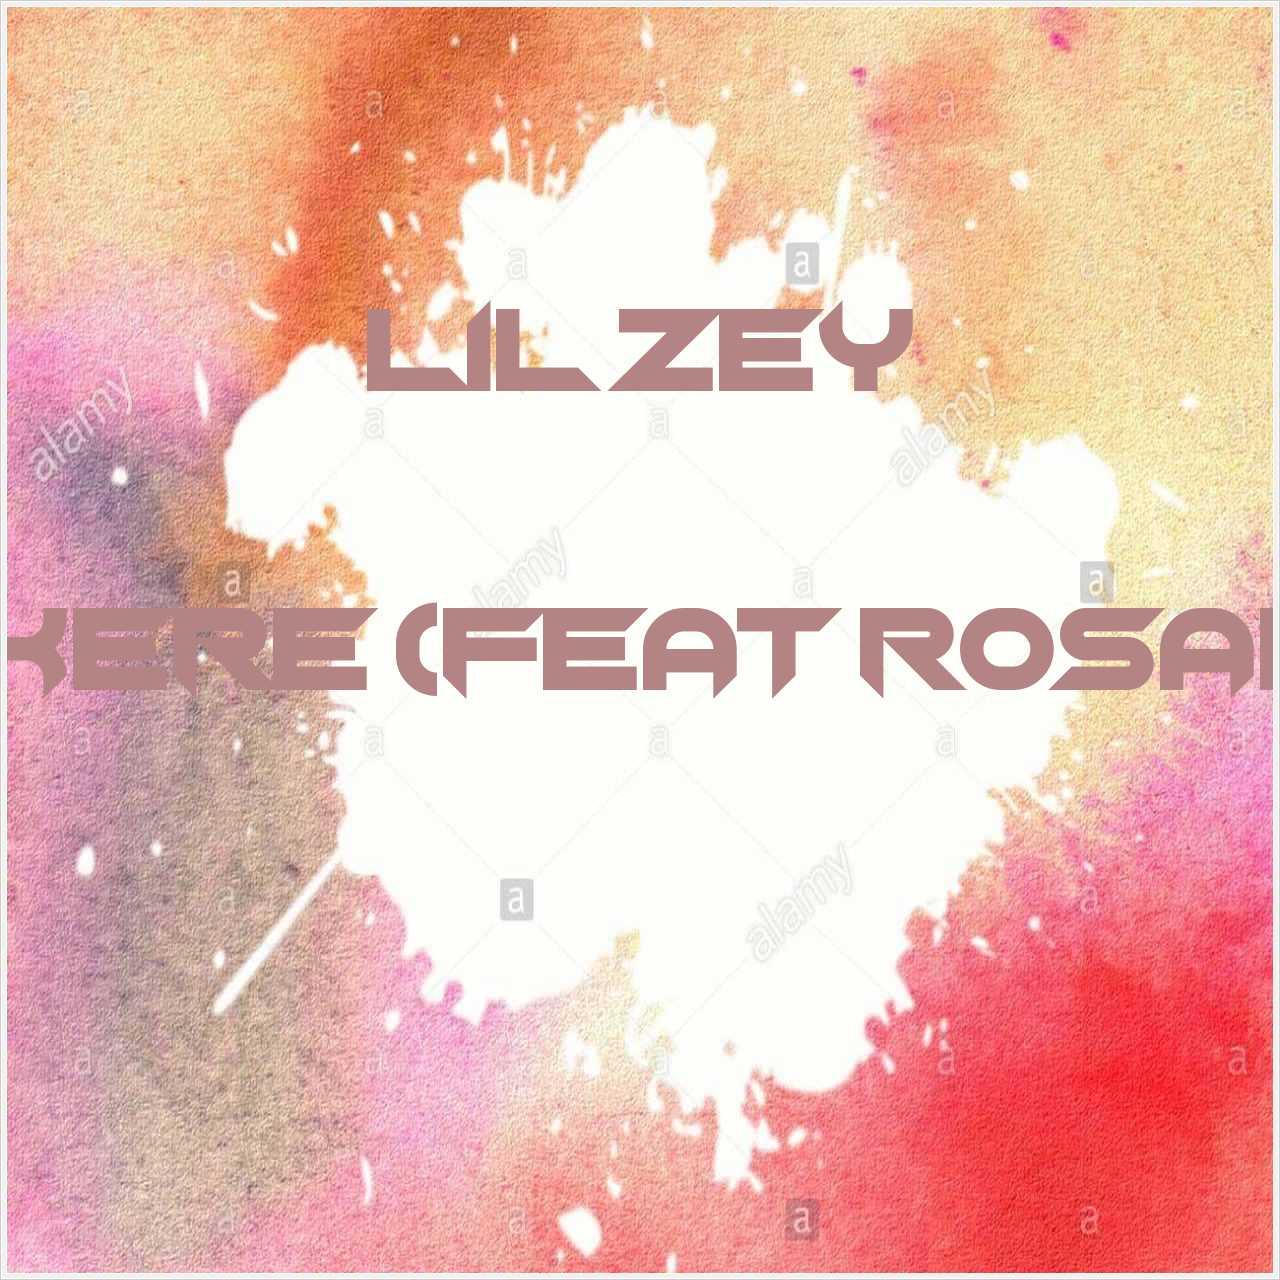 دانلود آهنگ جدید Lil Zey به نام 80 Kere (feat Rosalie)